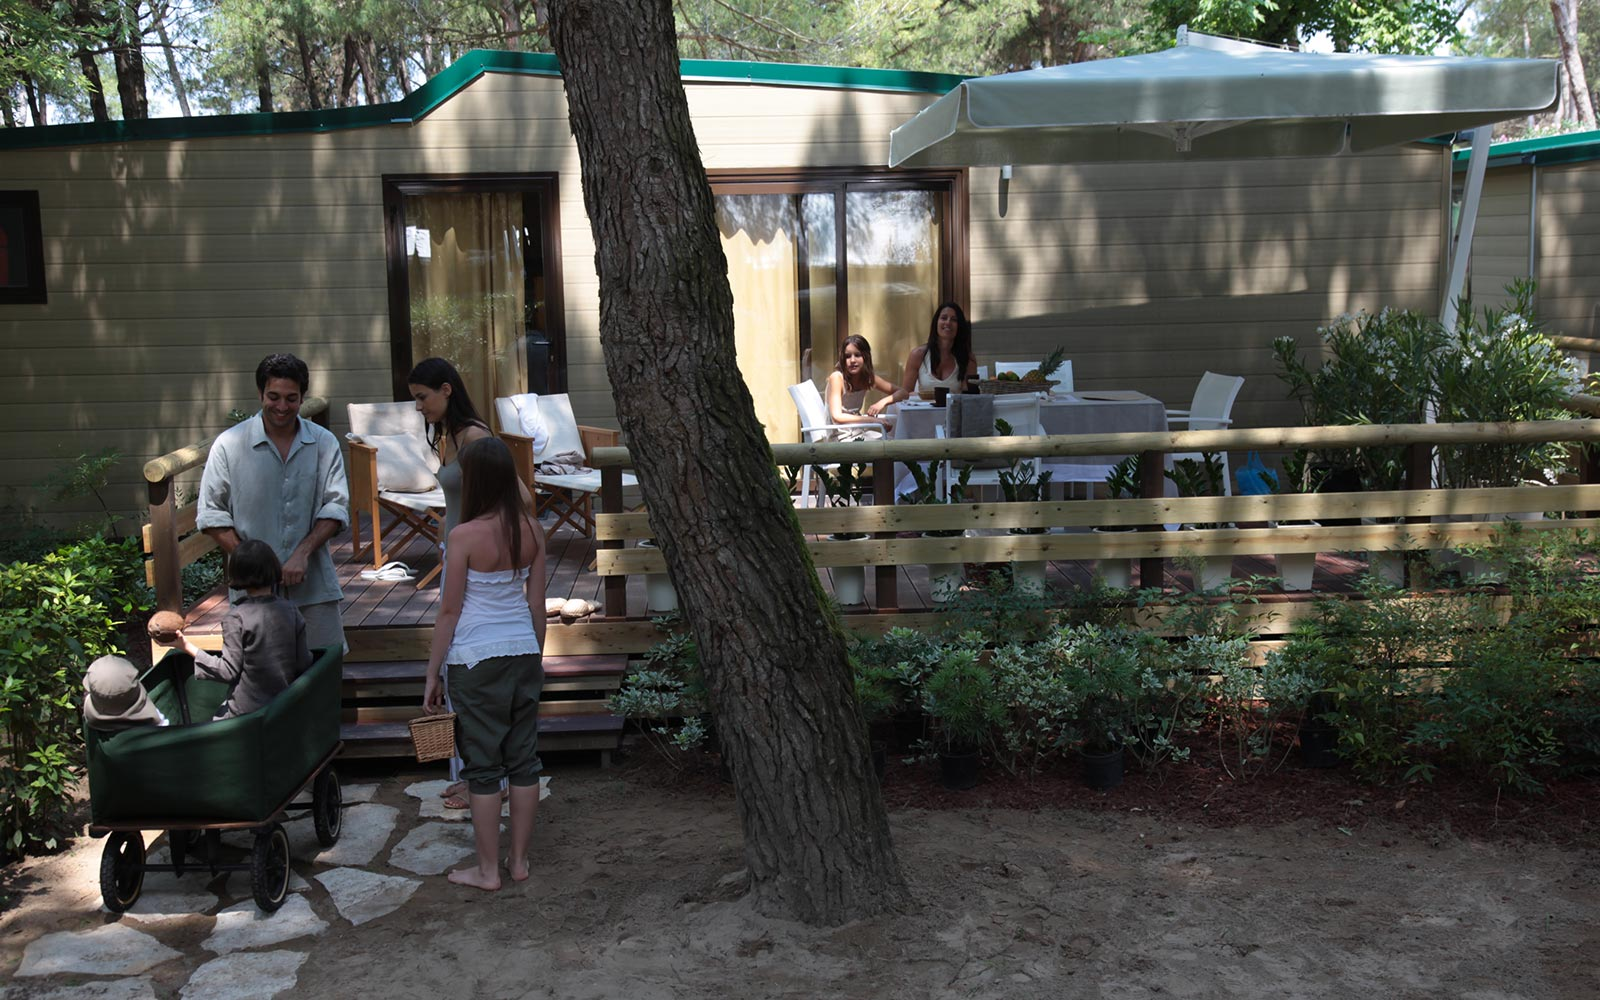 4-wooneenheid Camping Dei Fiori